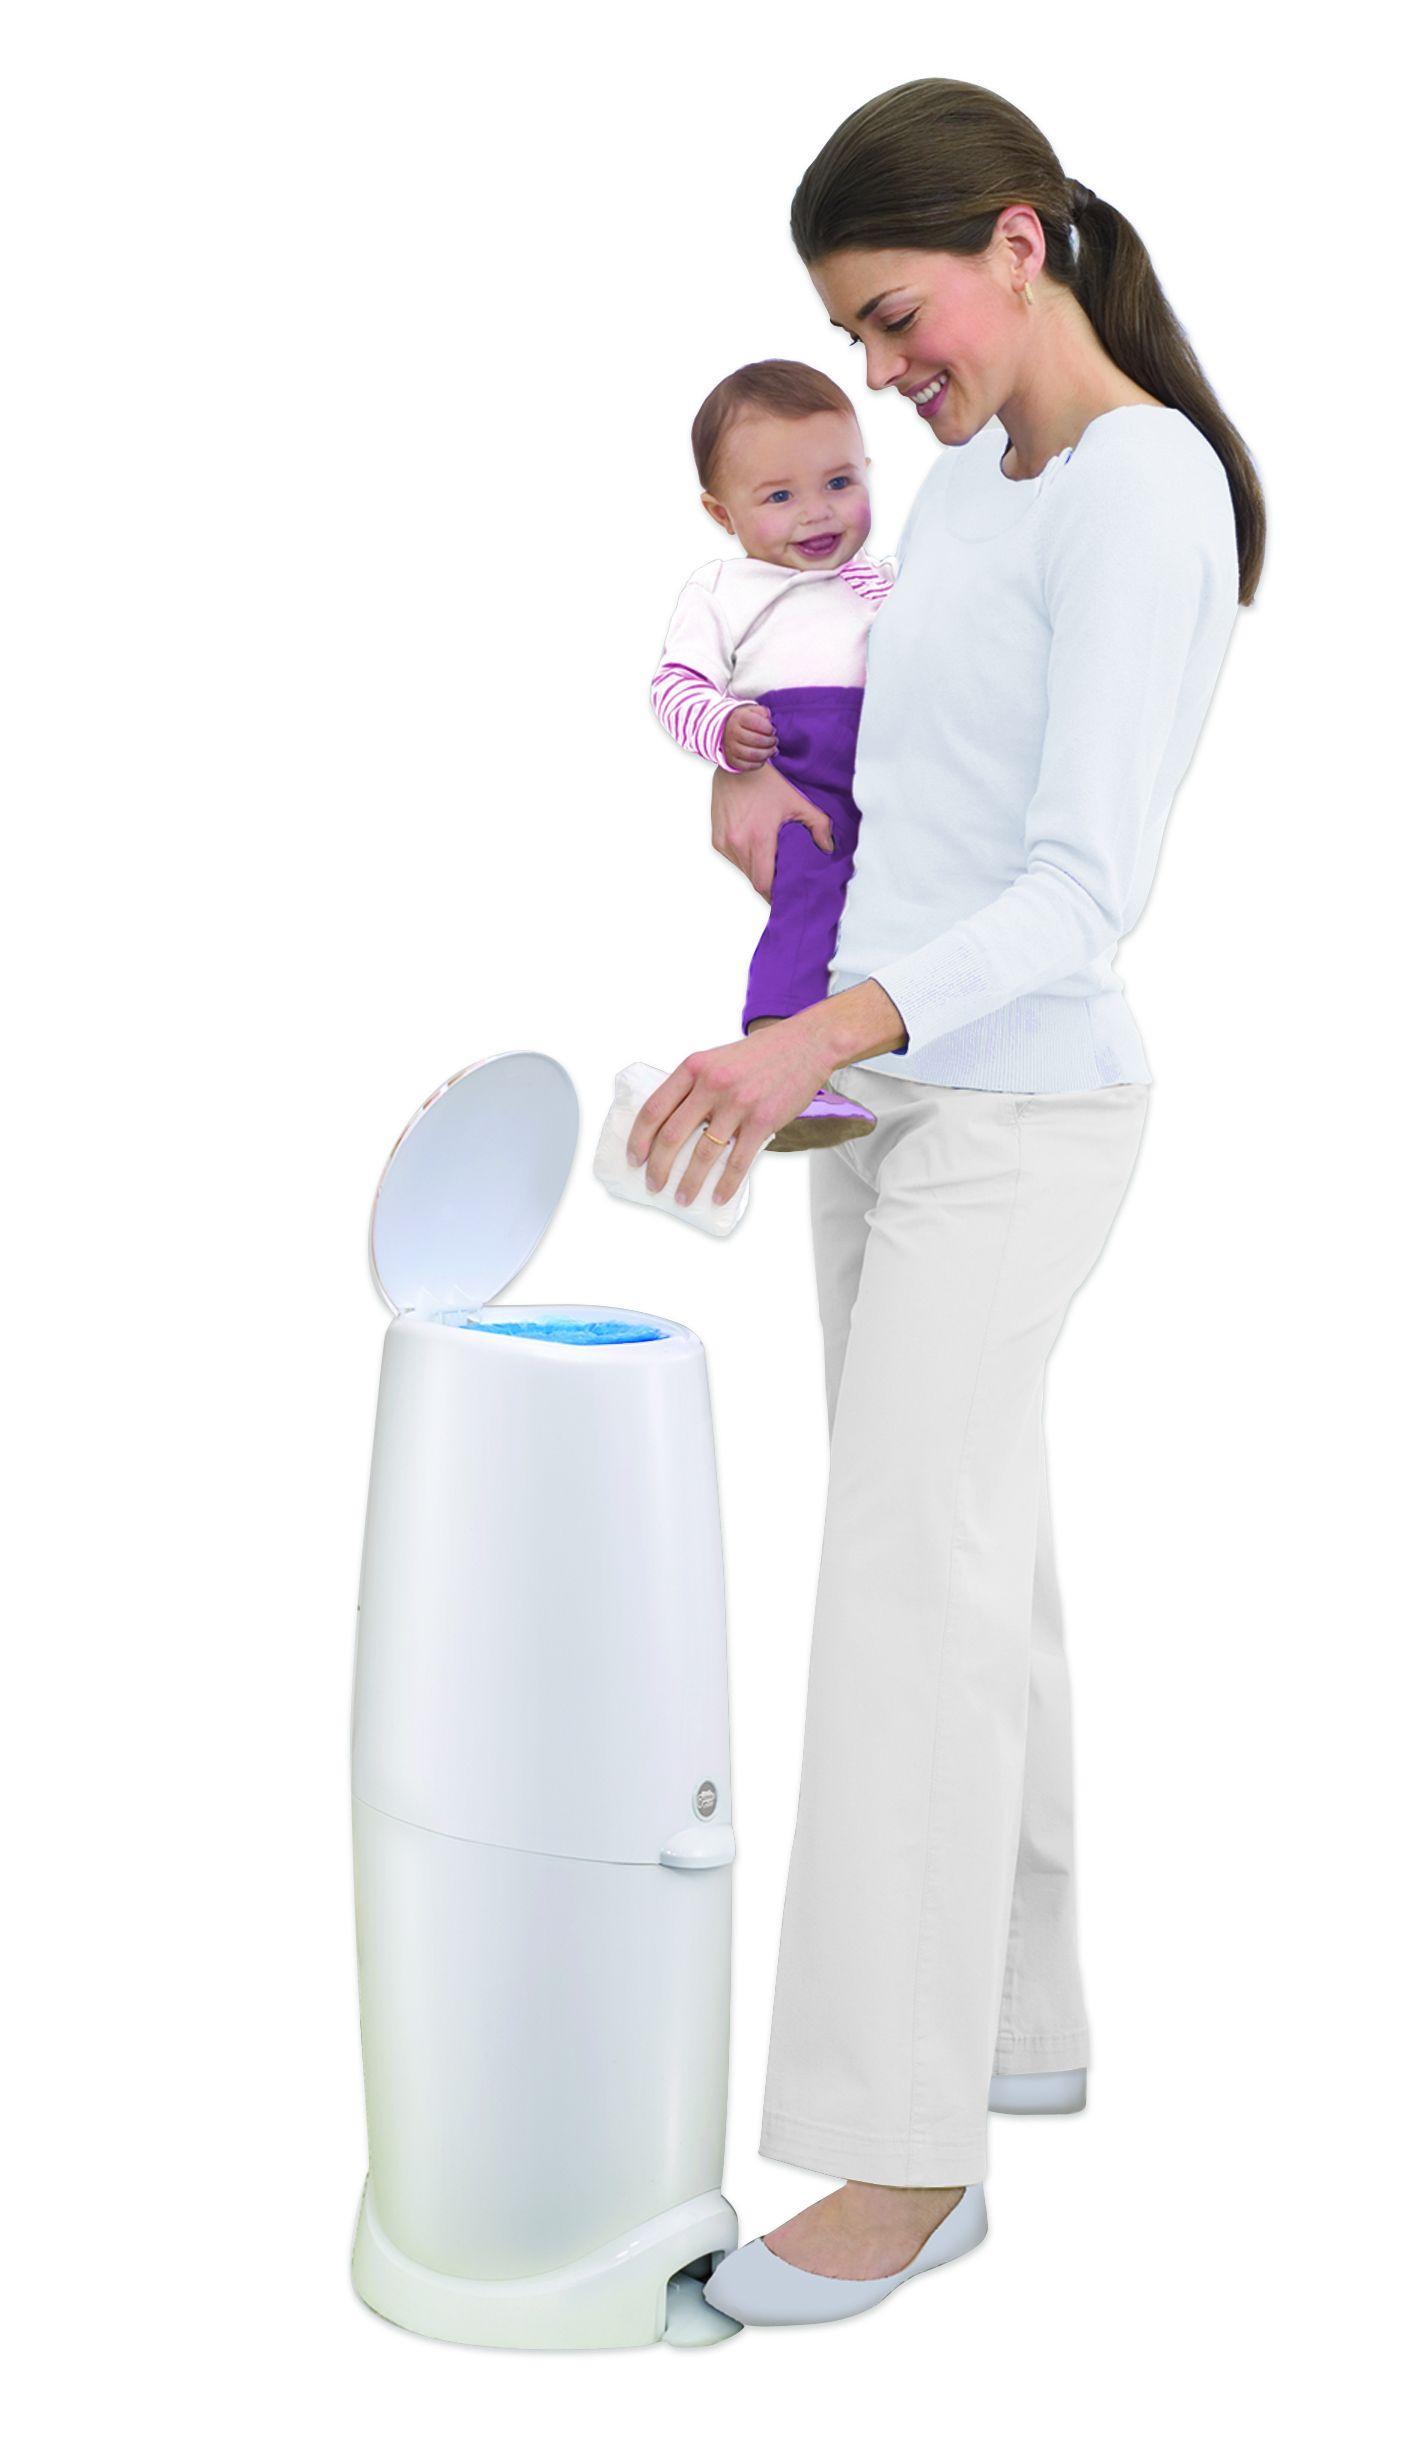 Amazon.com : Playtex Diaper Genie Elite Pail System with